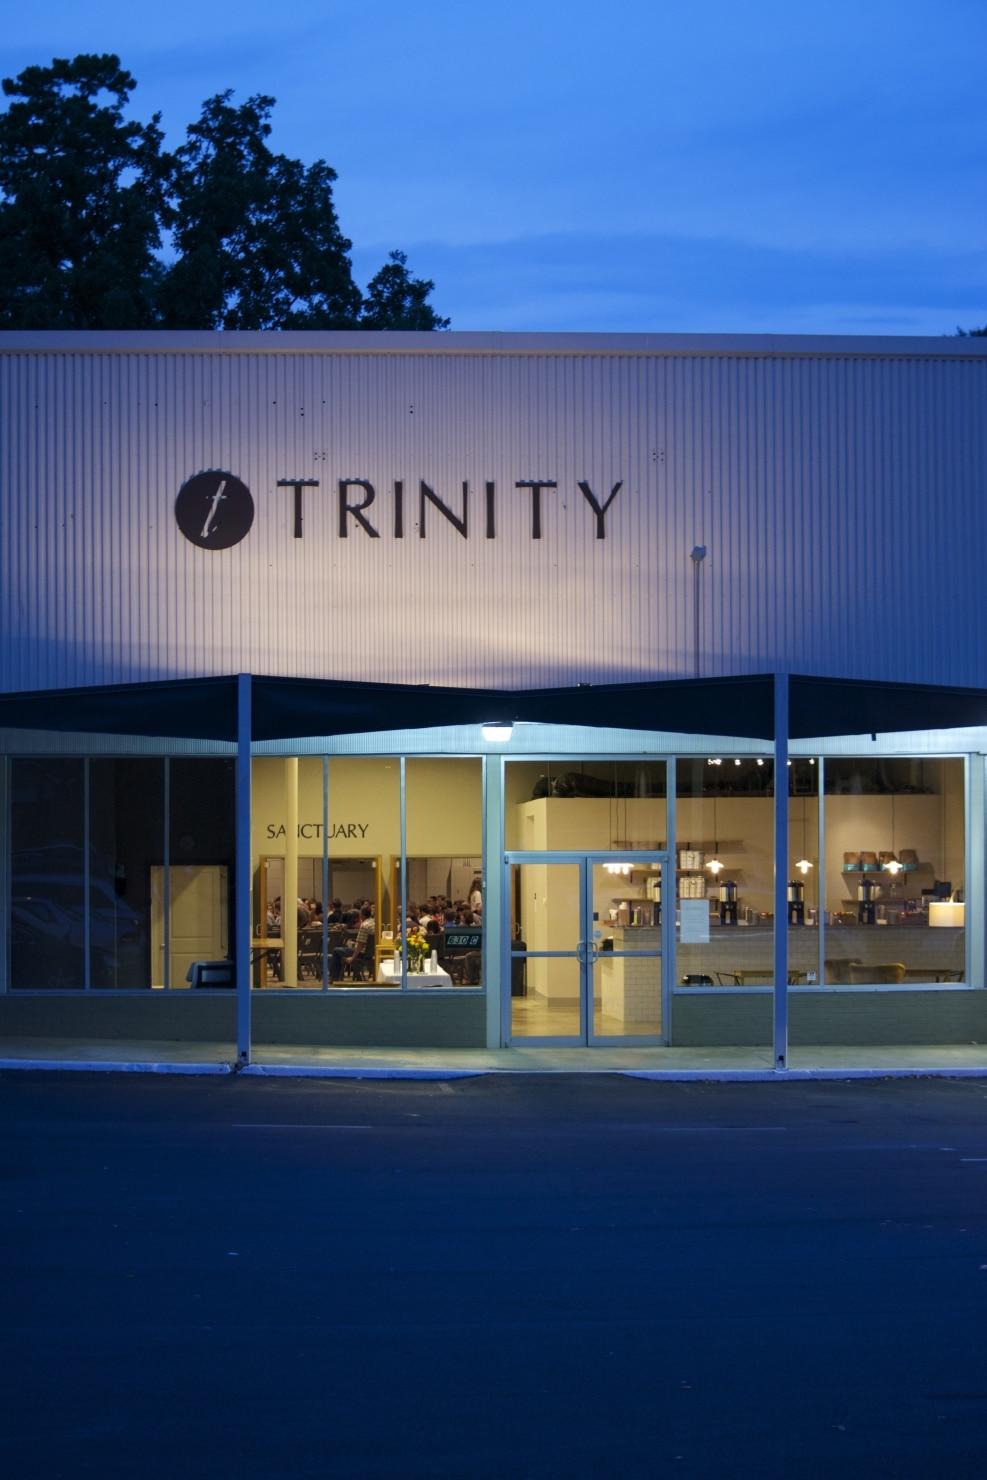 Eastside Trinity Angelican Church